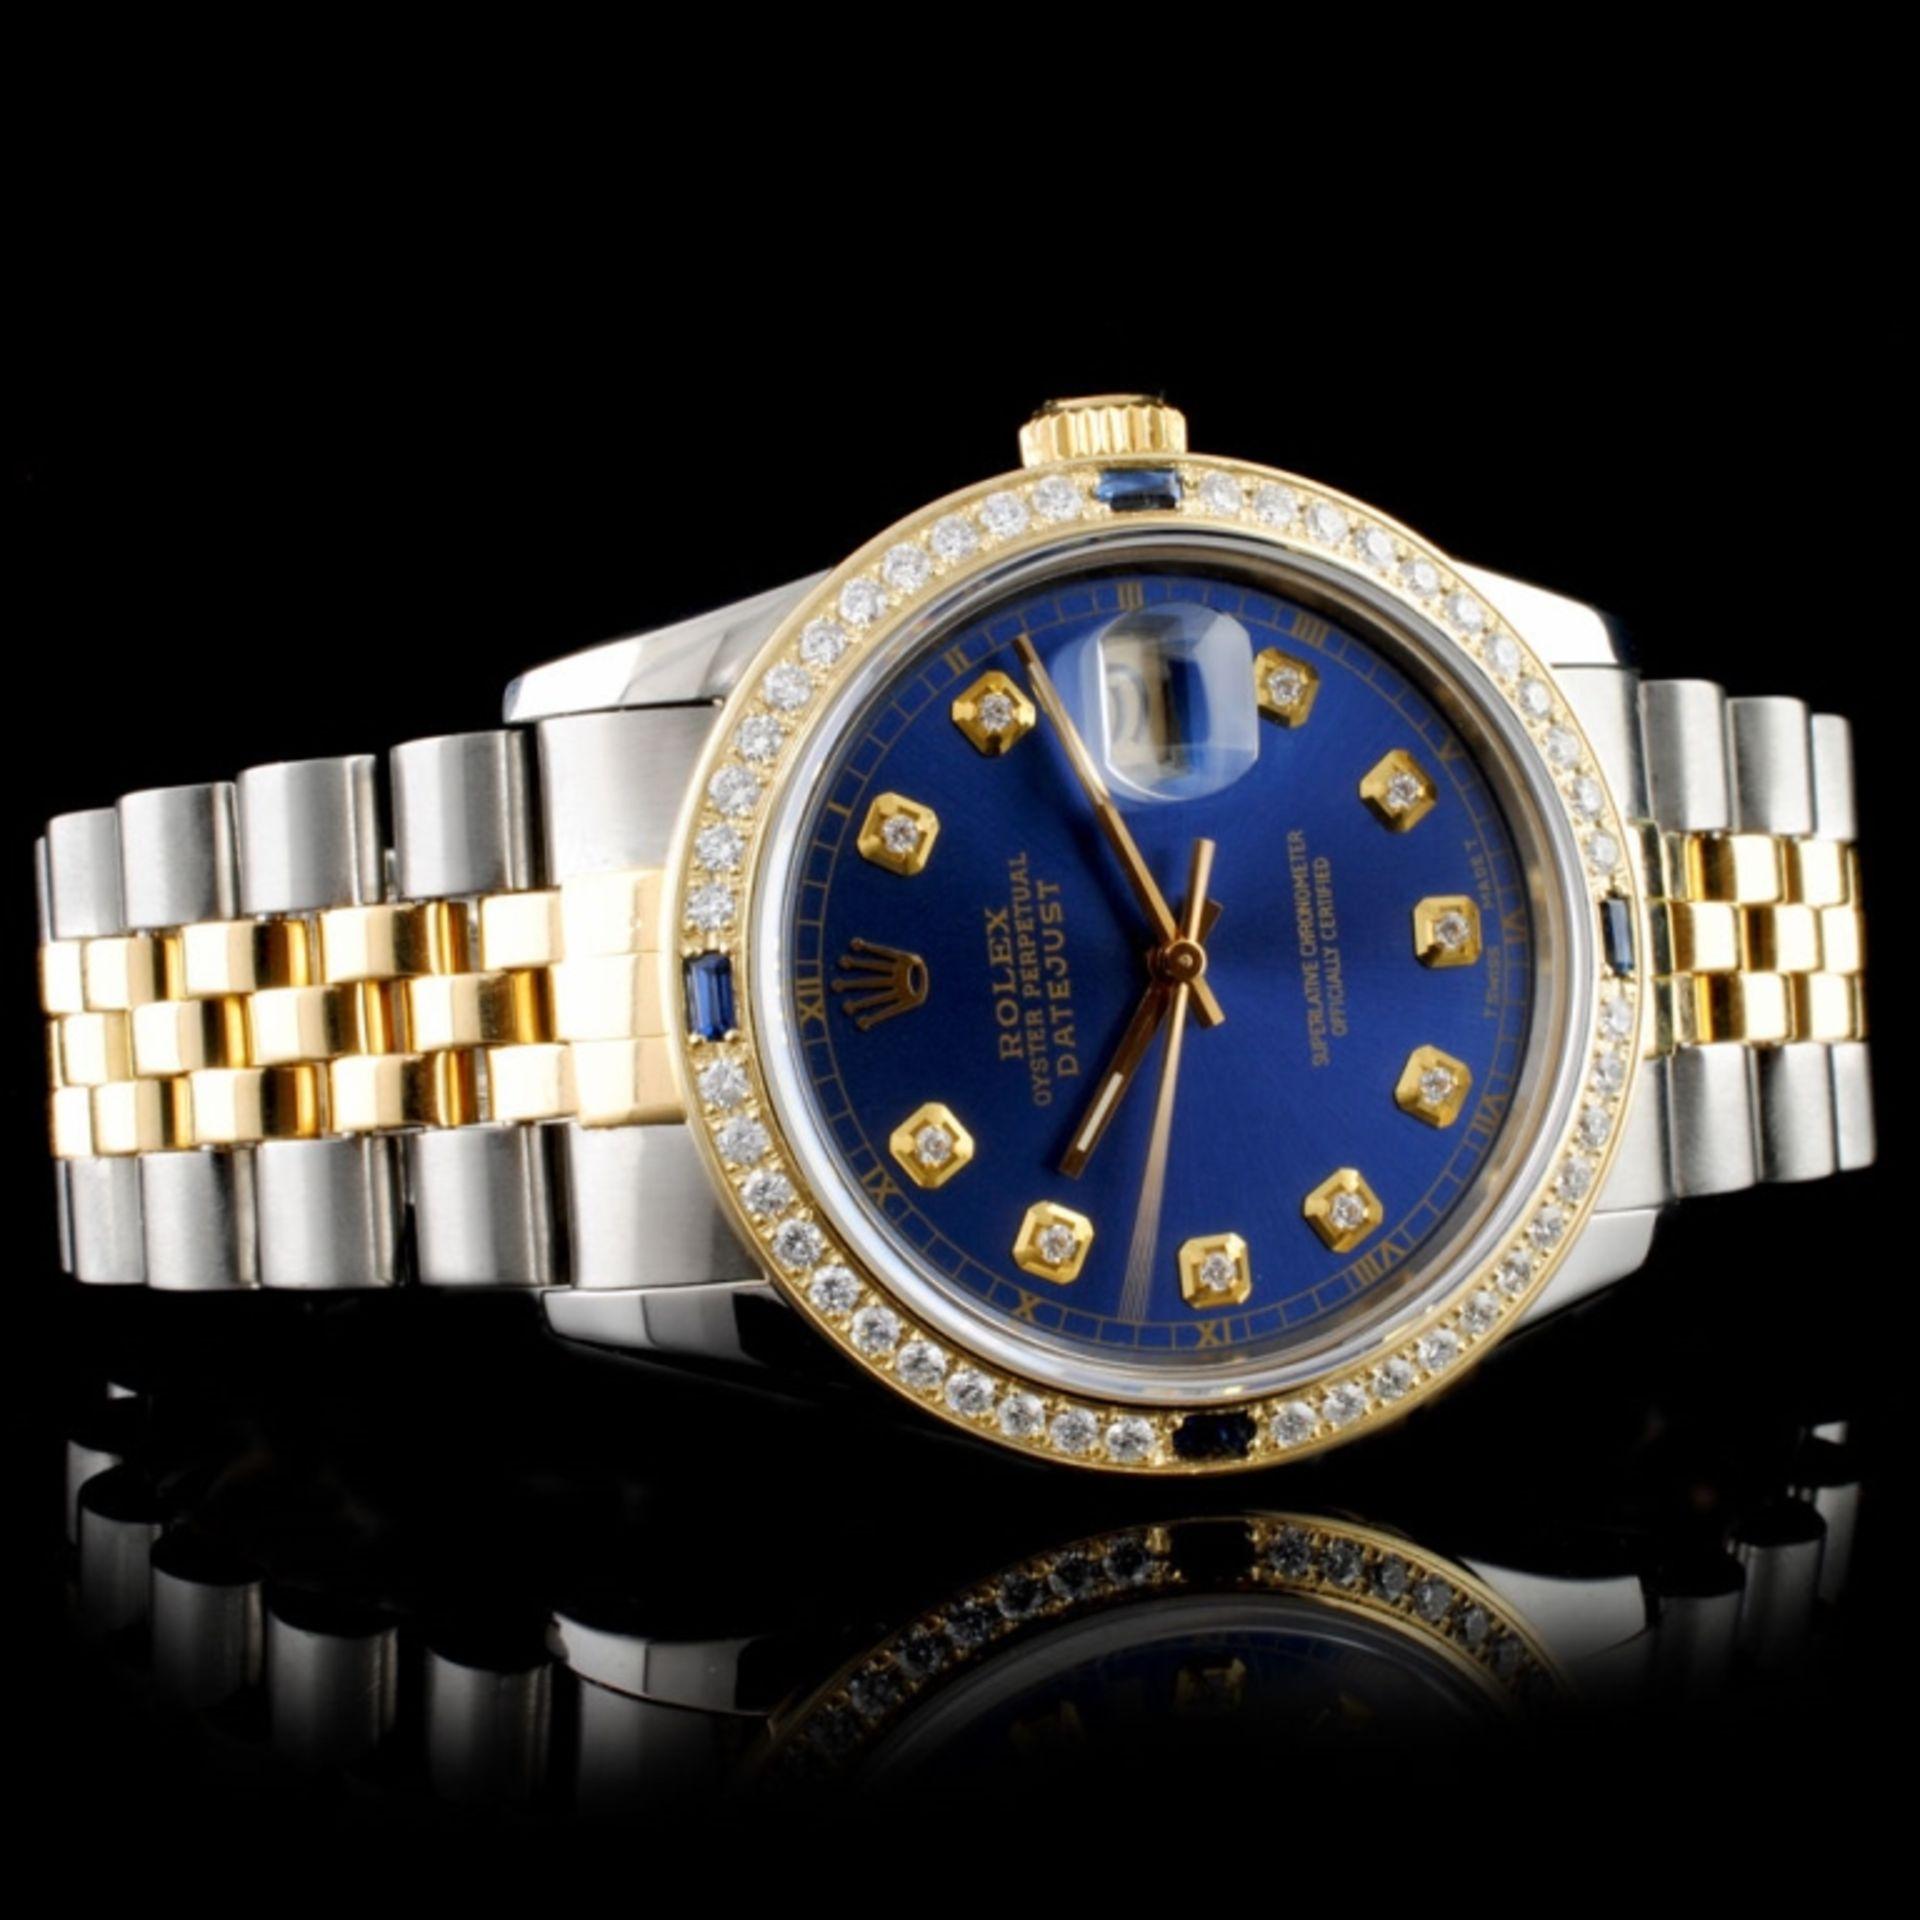 Rolex DateJust 36MM 1.50ct Diamond Wristwatch - Image 2 of 7